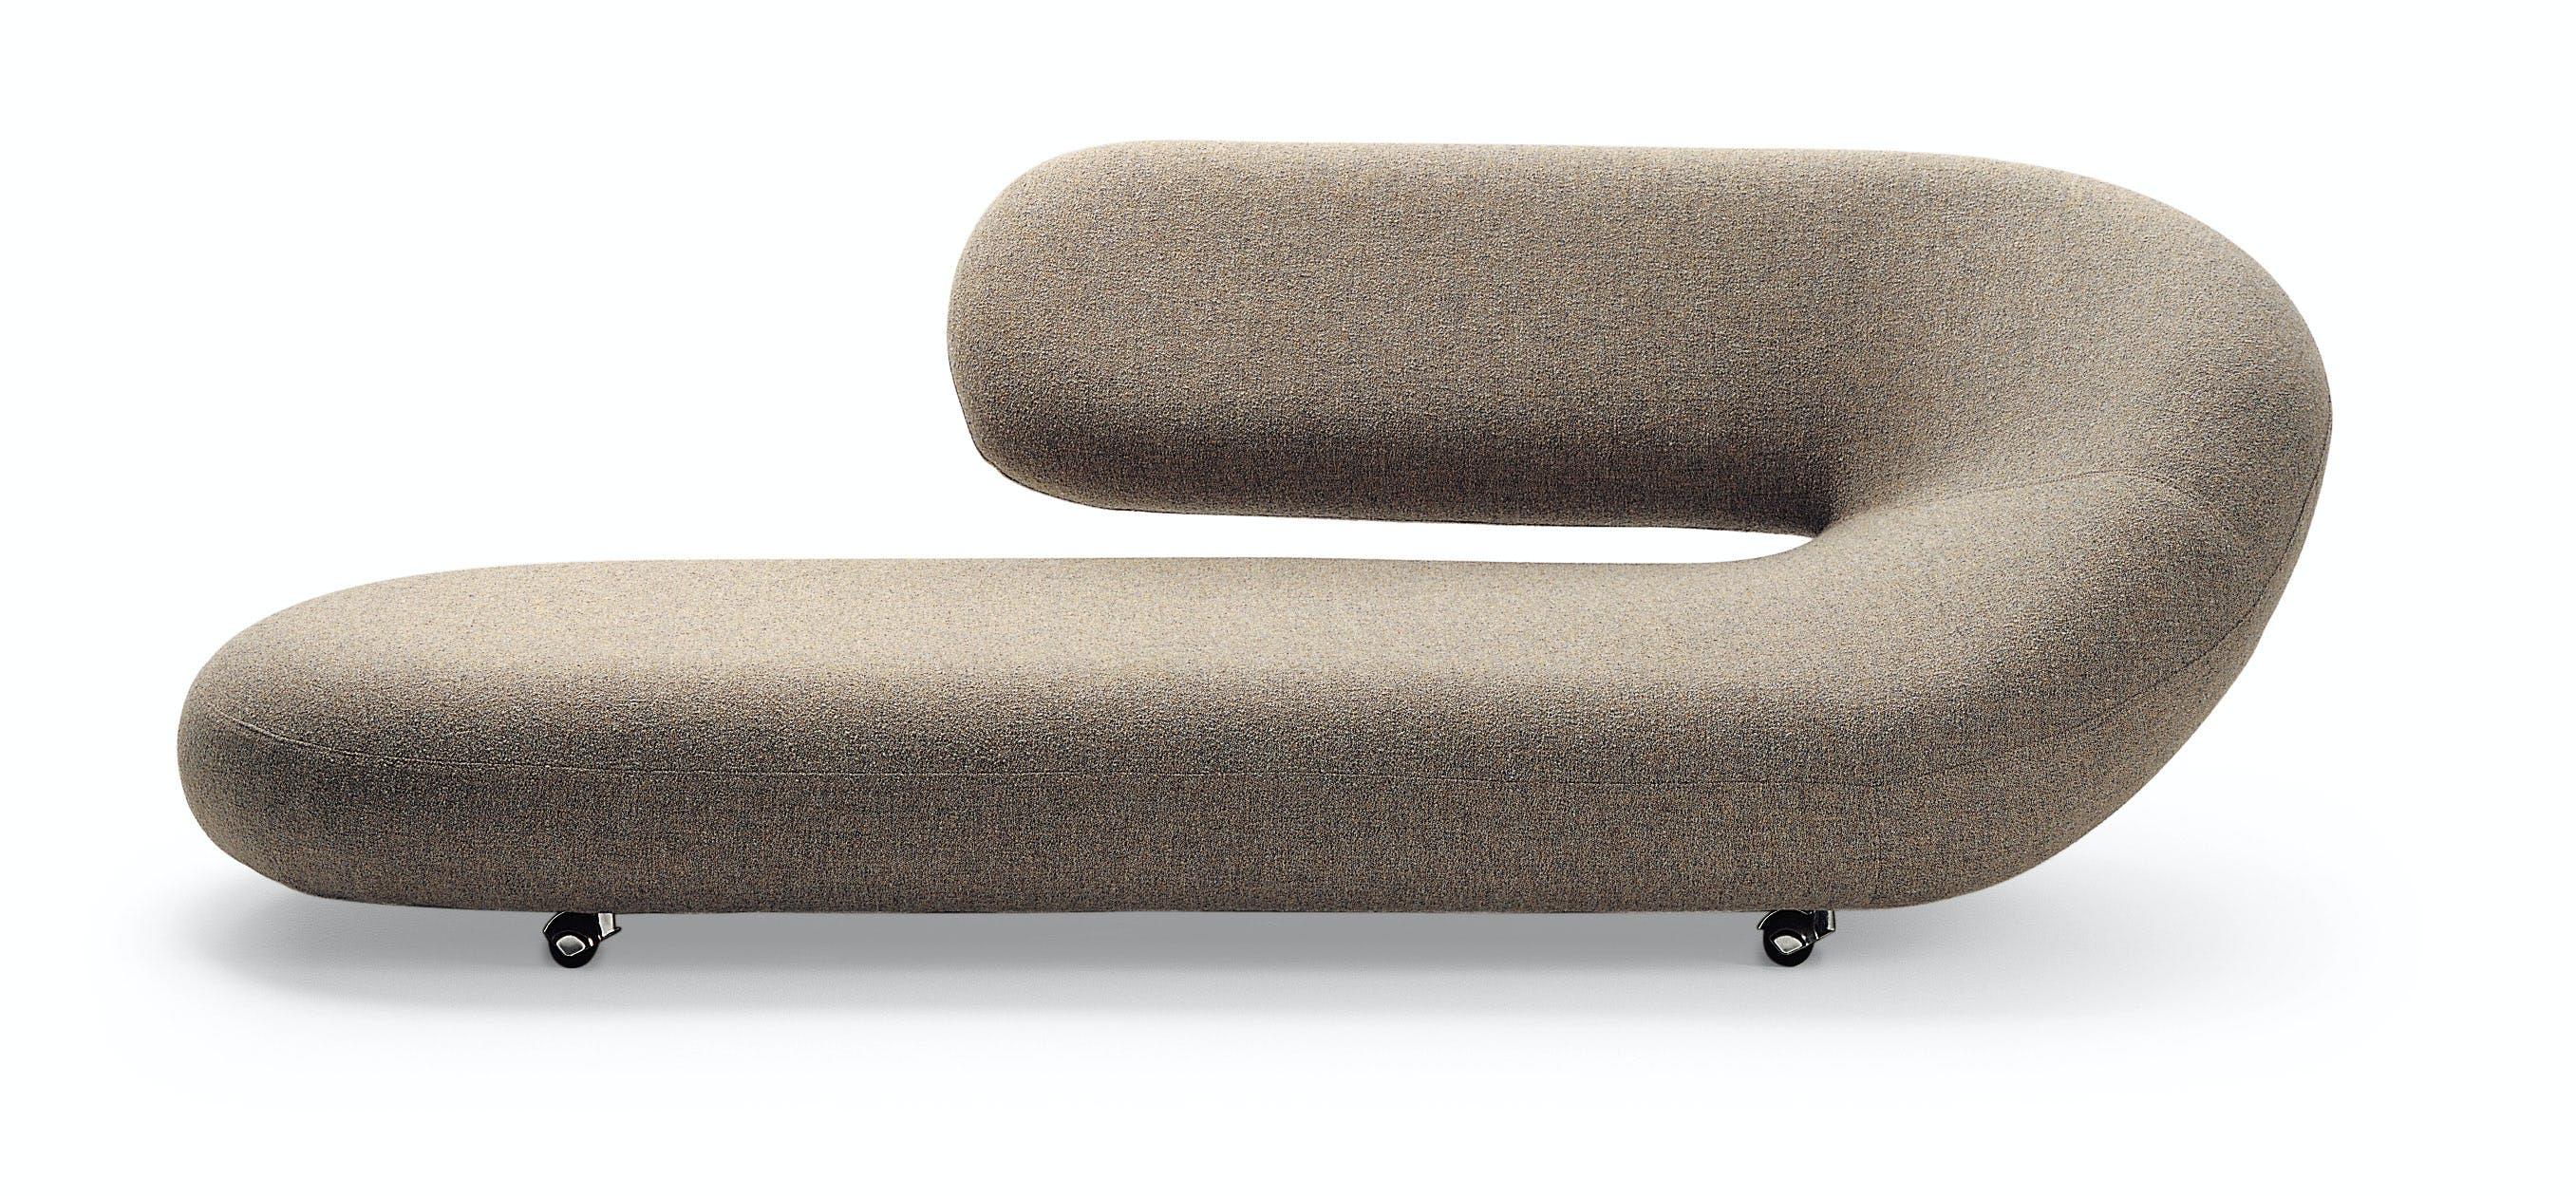 Chaise Lounge Sofa 1